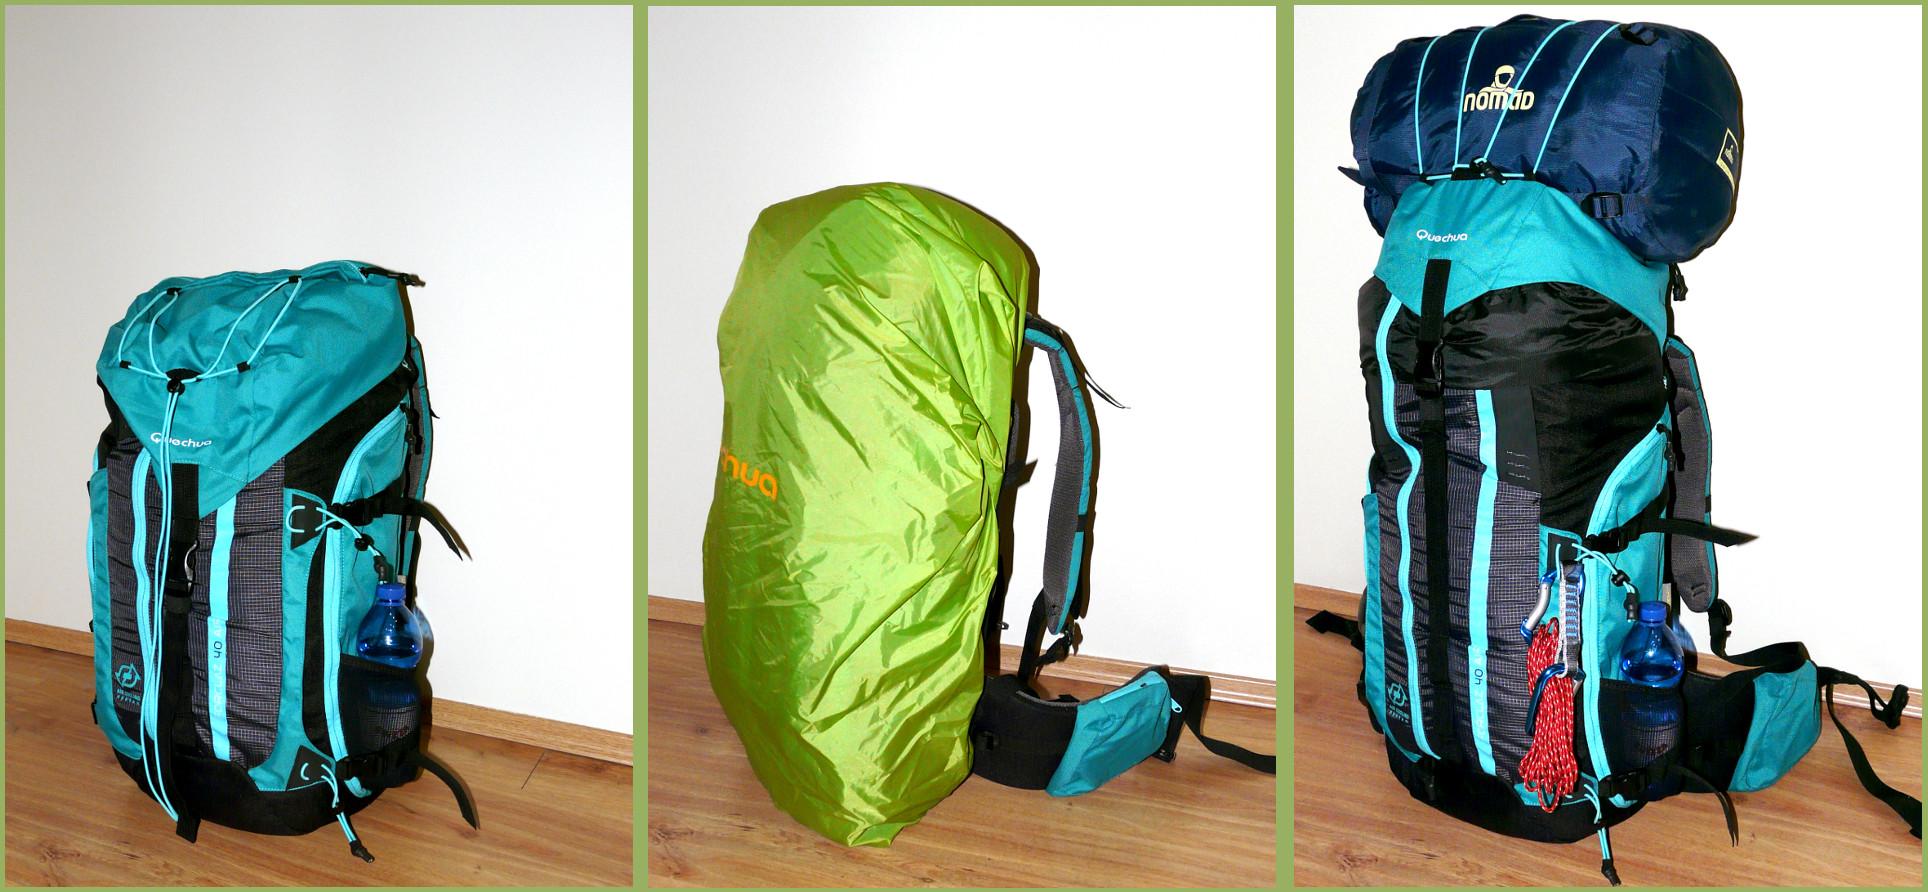 Gear Review Quechua Forclaz 40 Air Backpack